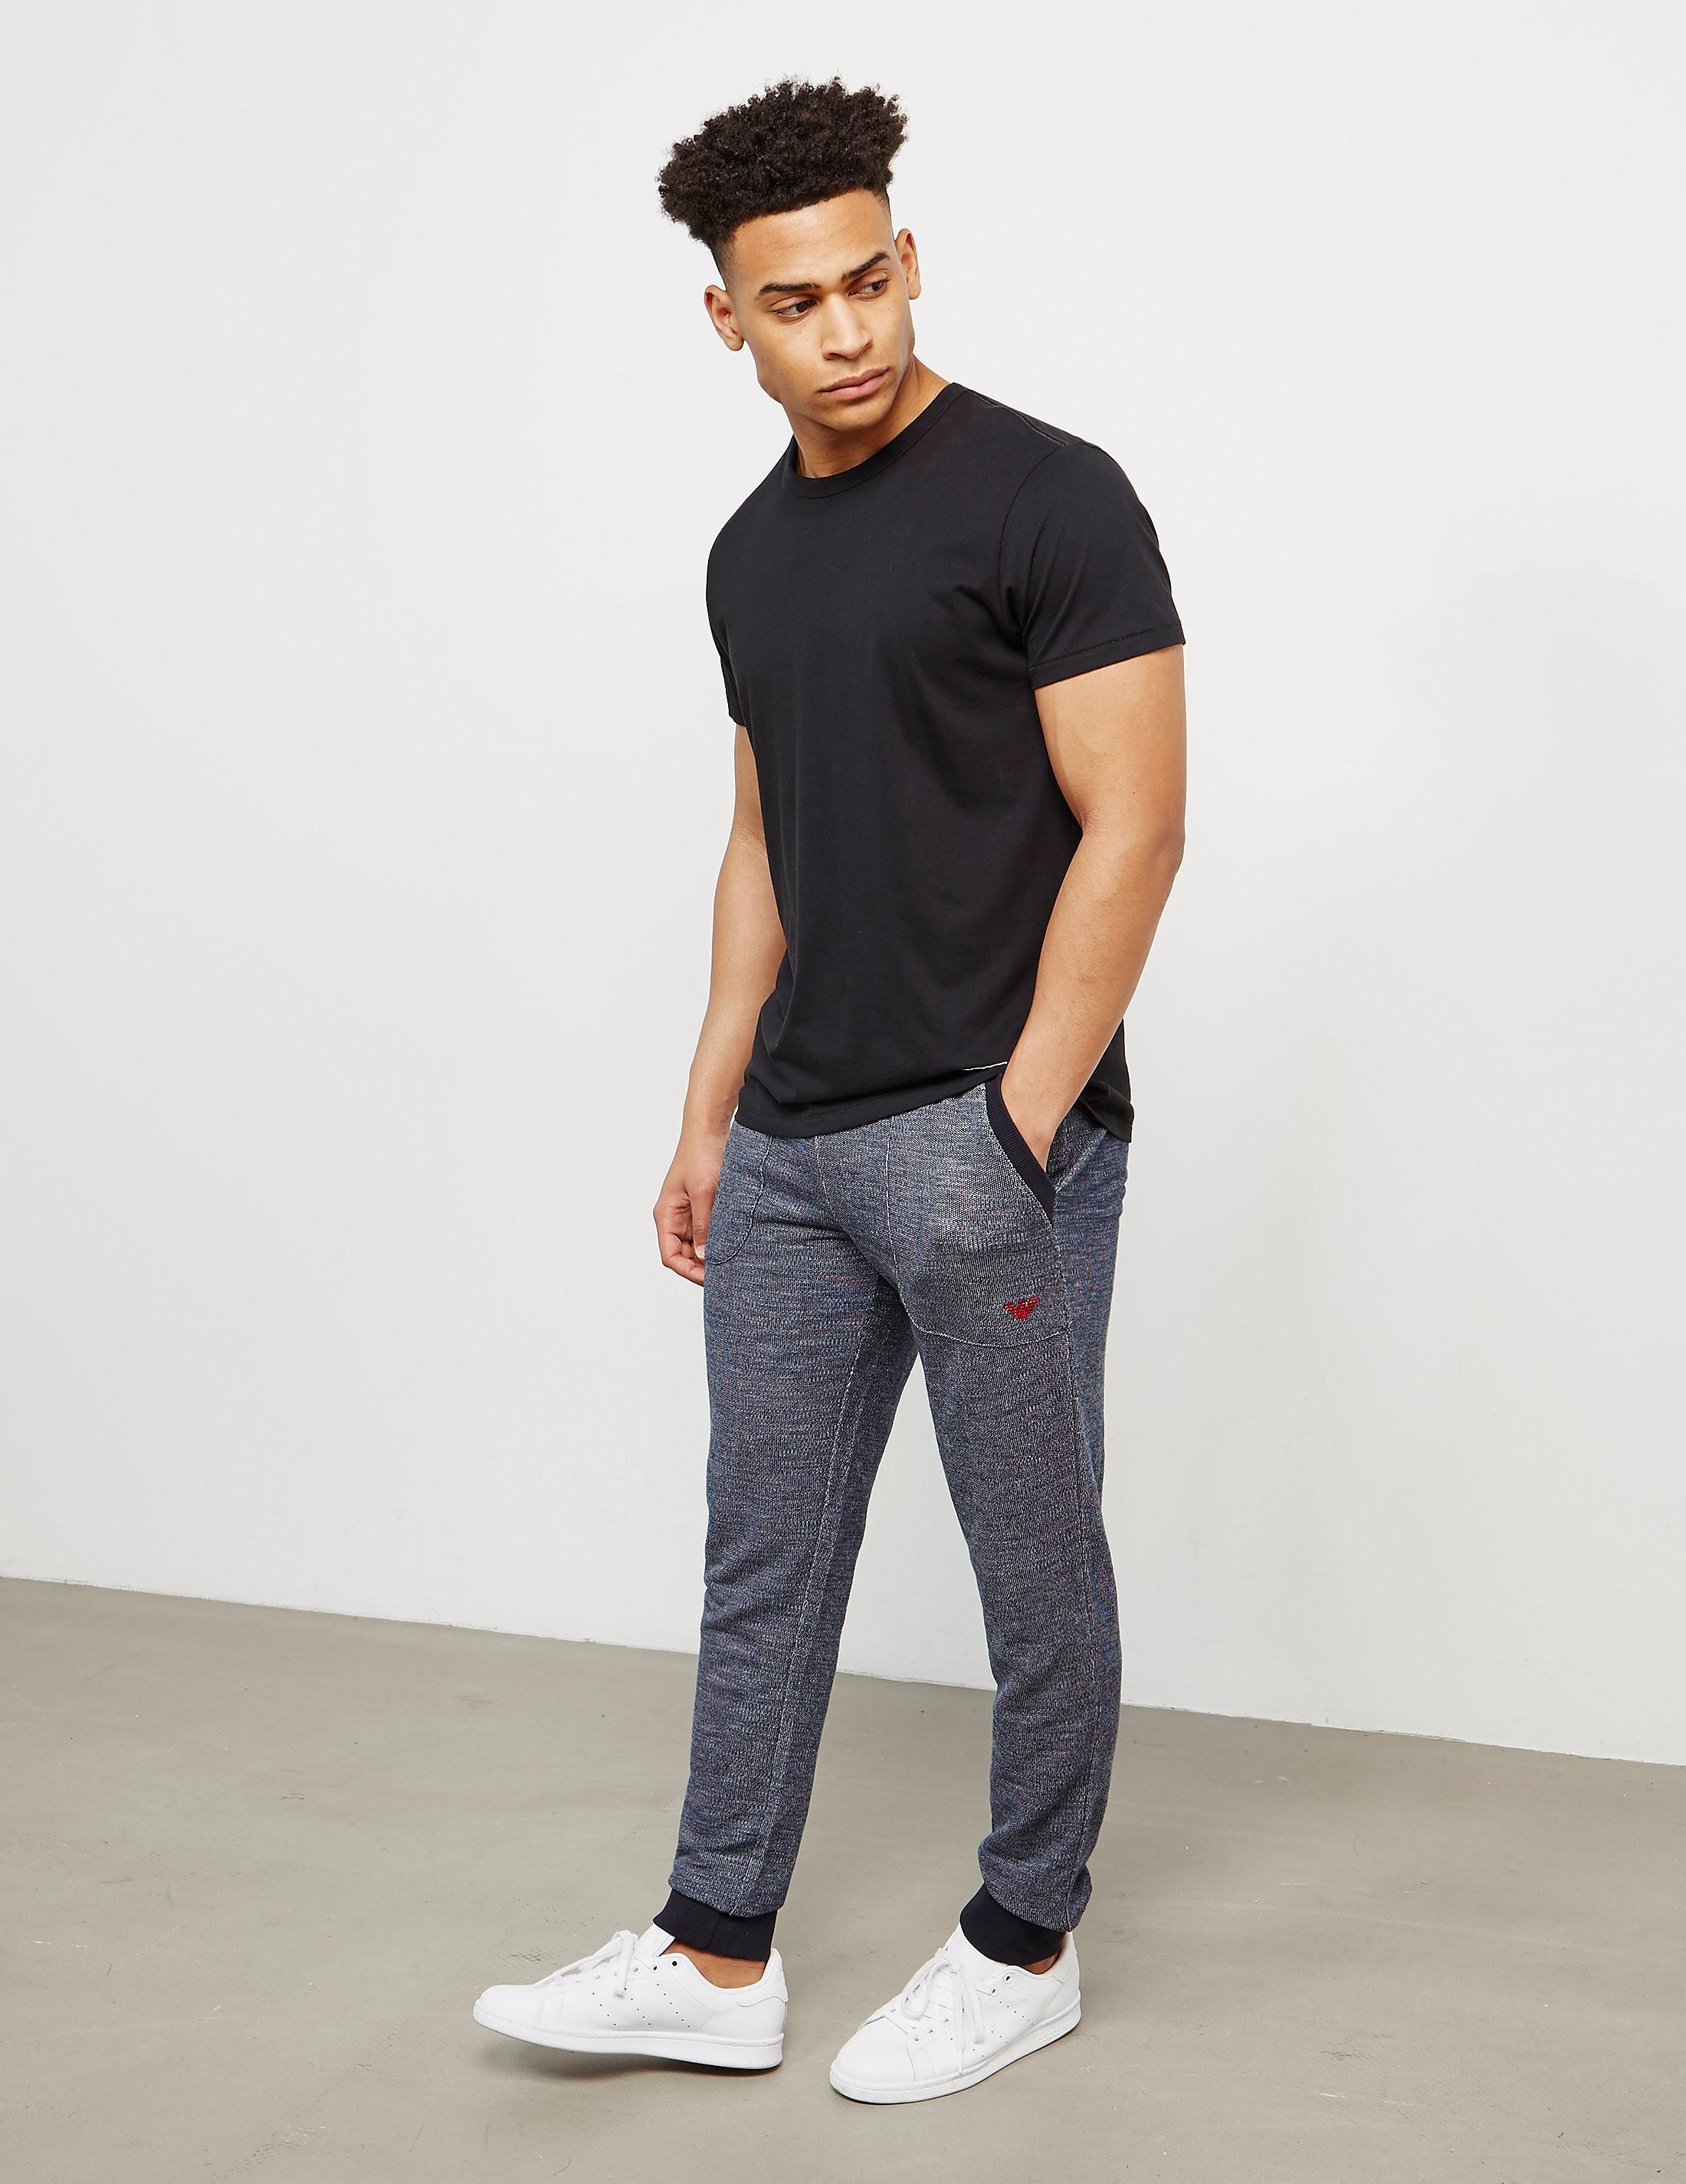 Emporio Armani Cuffed Marl Fleece Pants